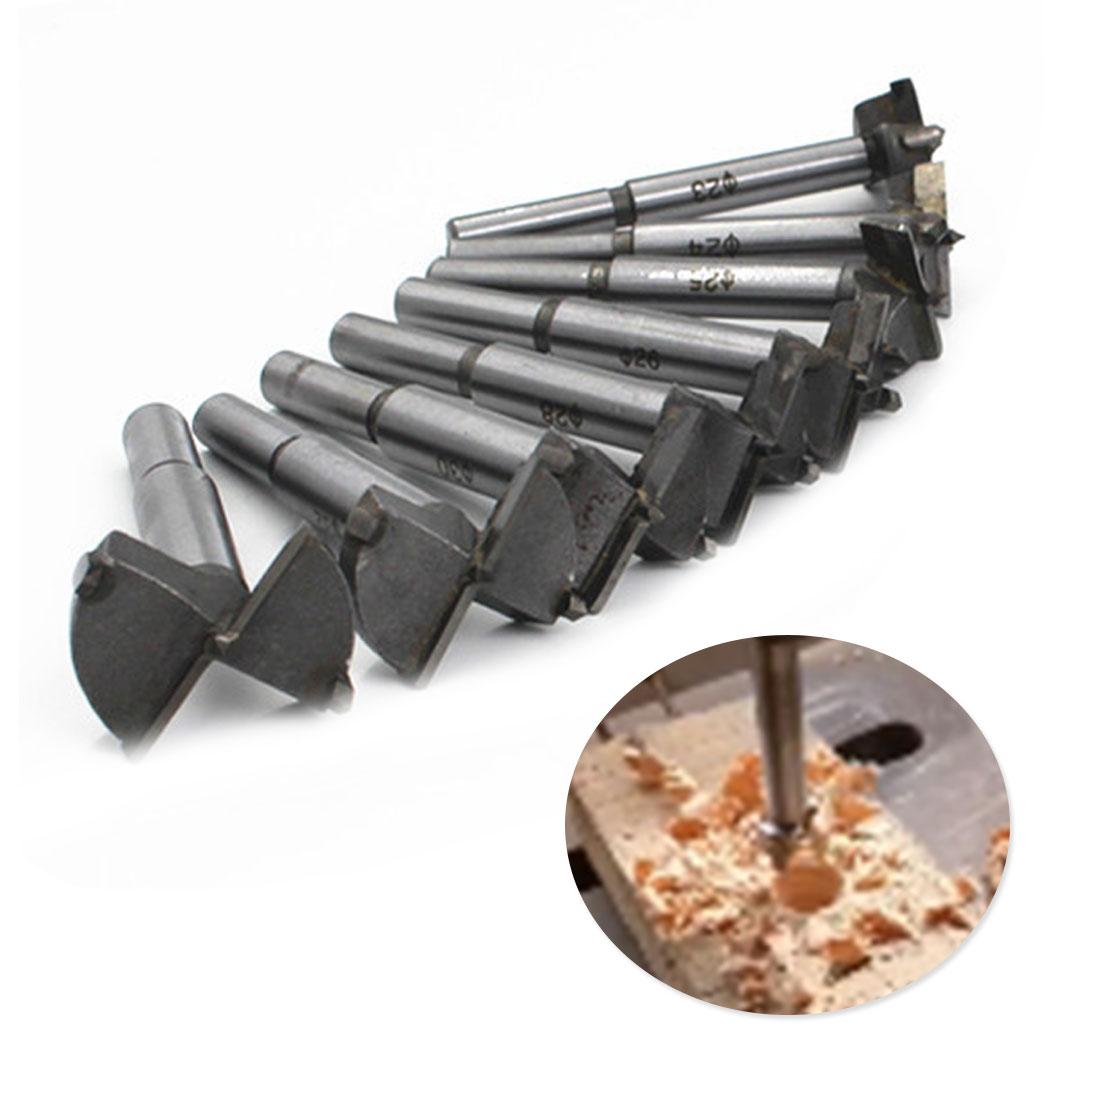 16 teile/satz Holzbearbeitung Loch Cutter Bit Hartmetall Bohrer 15 35mm Bohrer Set Flache Holz Bohren bits-in Bohrkronen aus Werkzeug bei AliExpress - 11.11_Doppel-11Tag der Singles 1